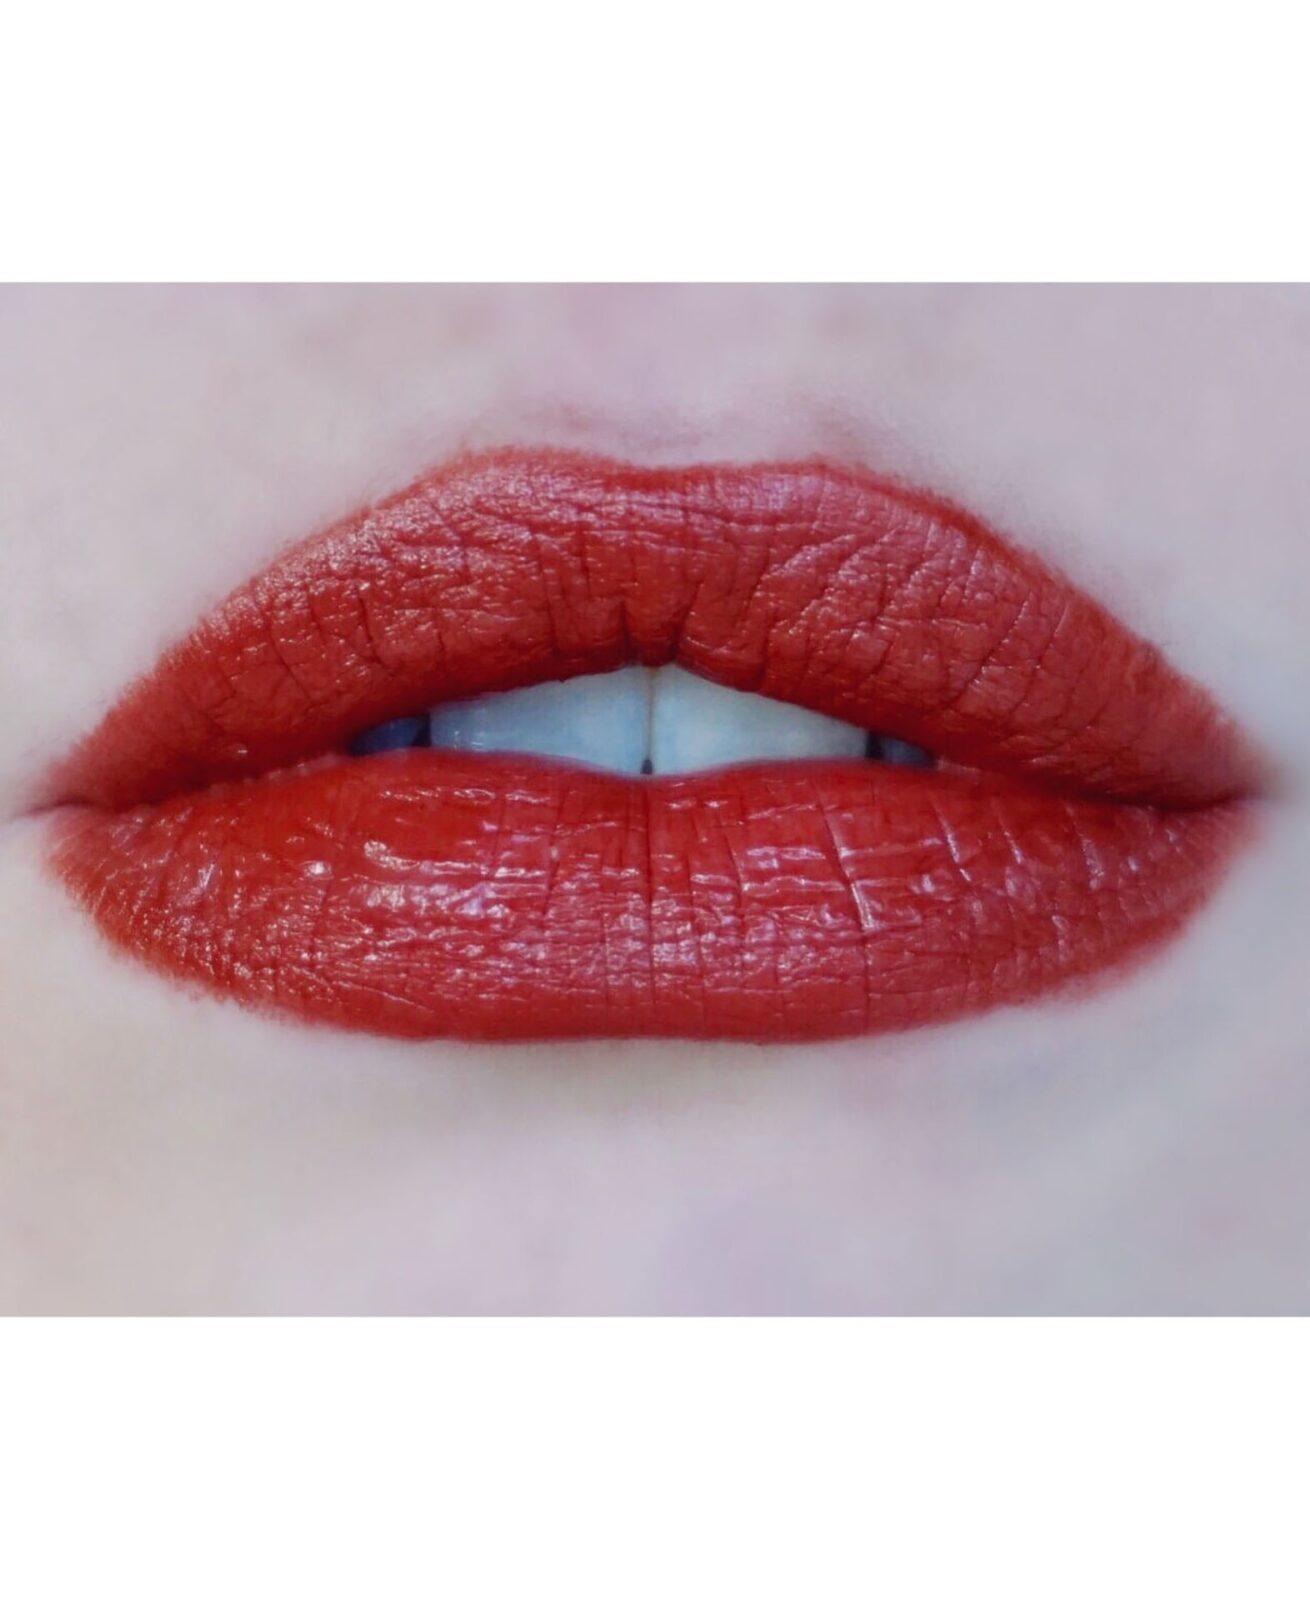 The Bullet Lipstick True